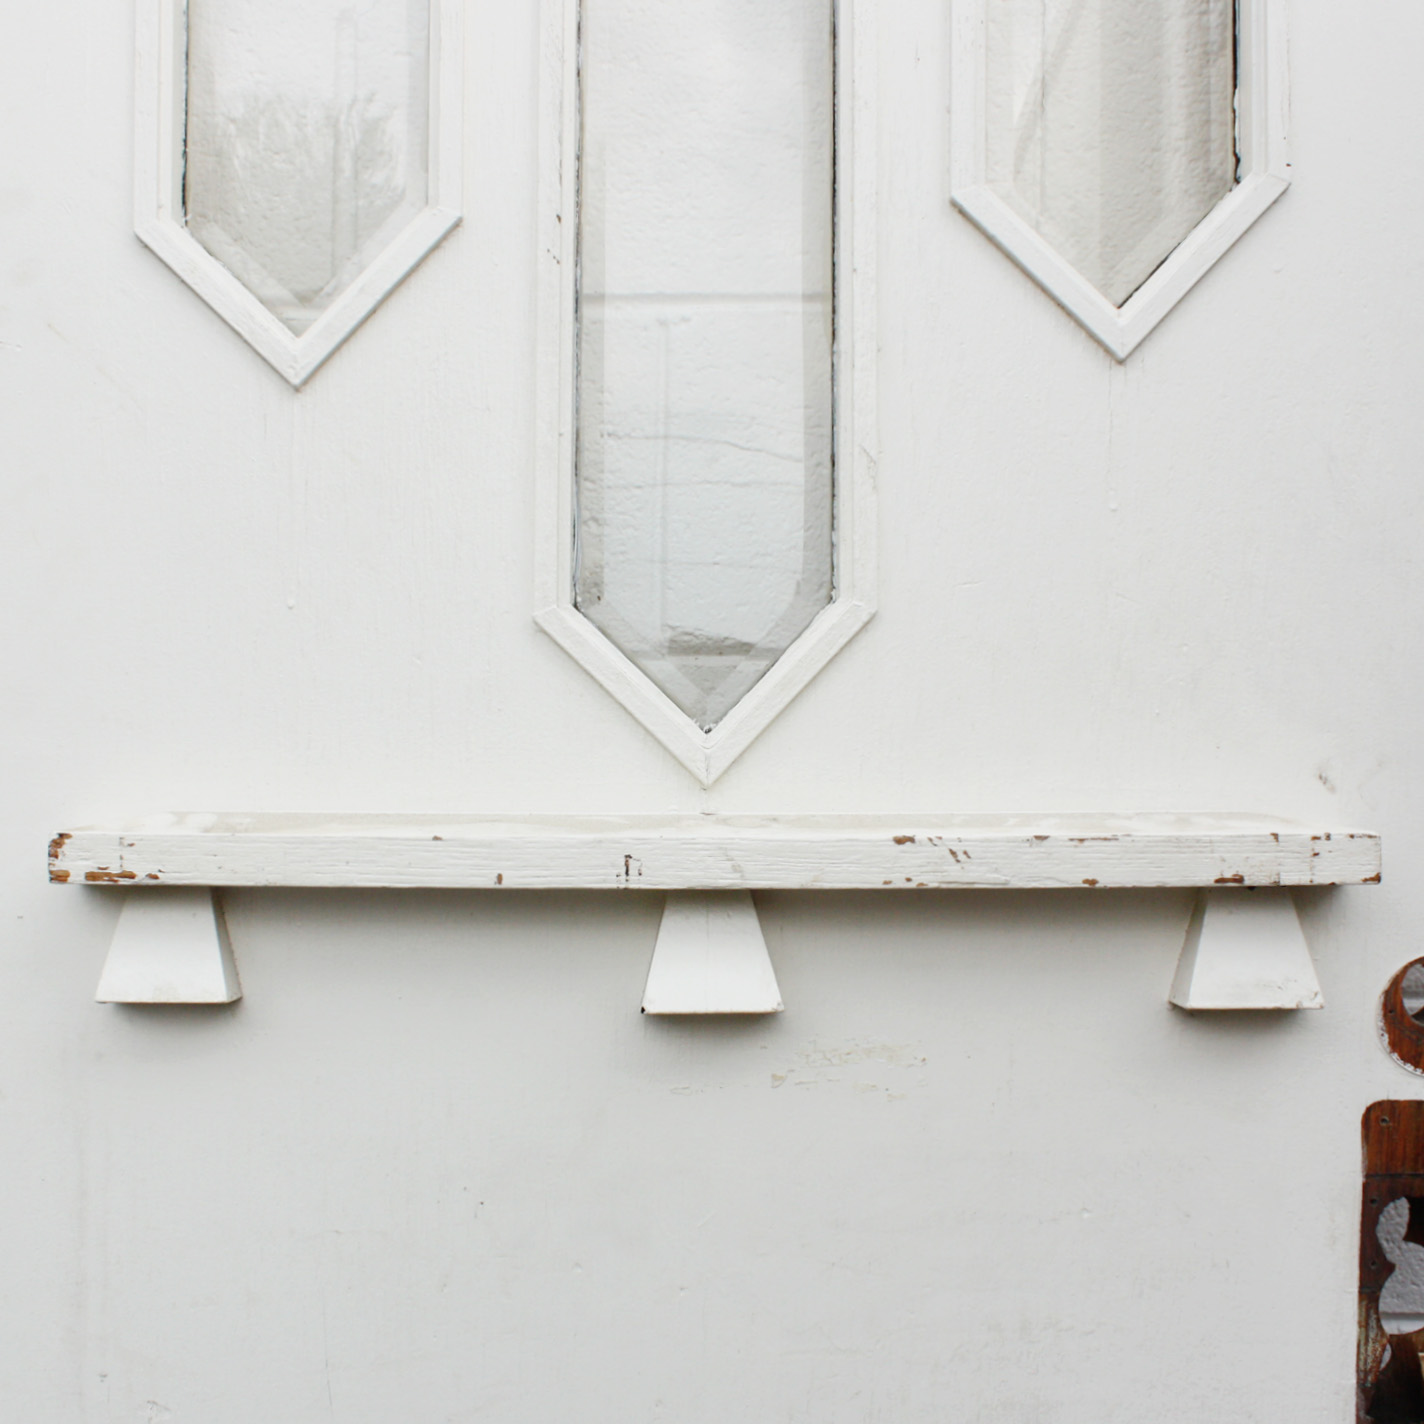 Wonderful Arts Crafts 36 Exterior Oak Door With Beveled Windows And Dentil Molding Ned178 Rw